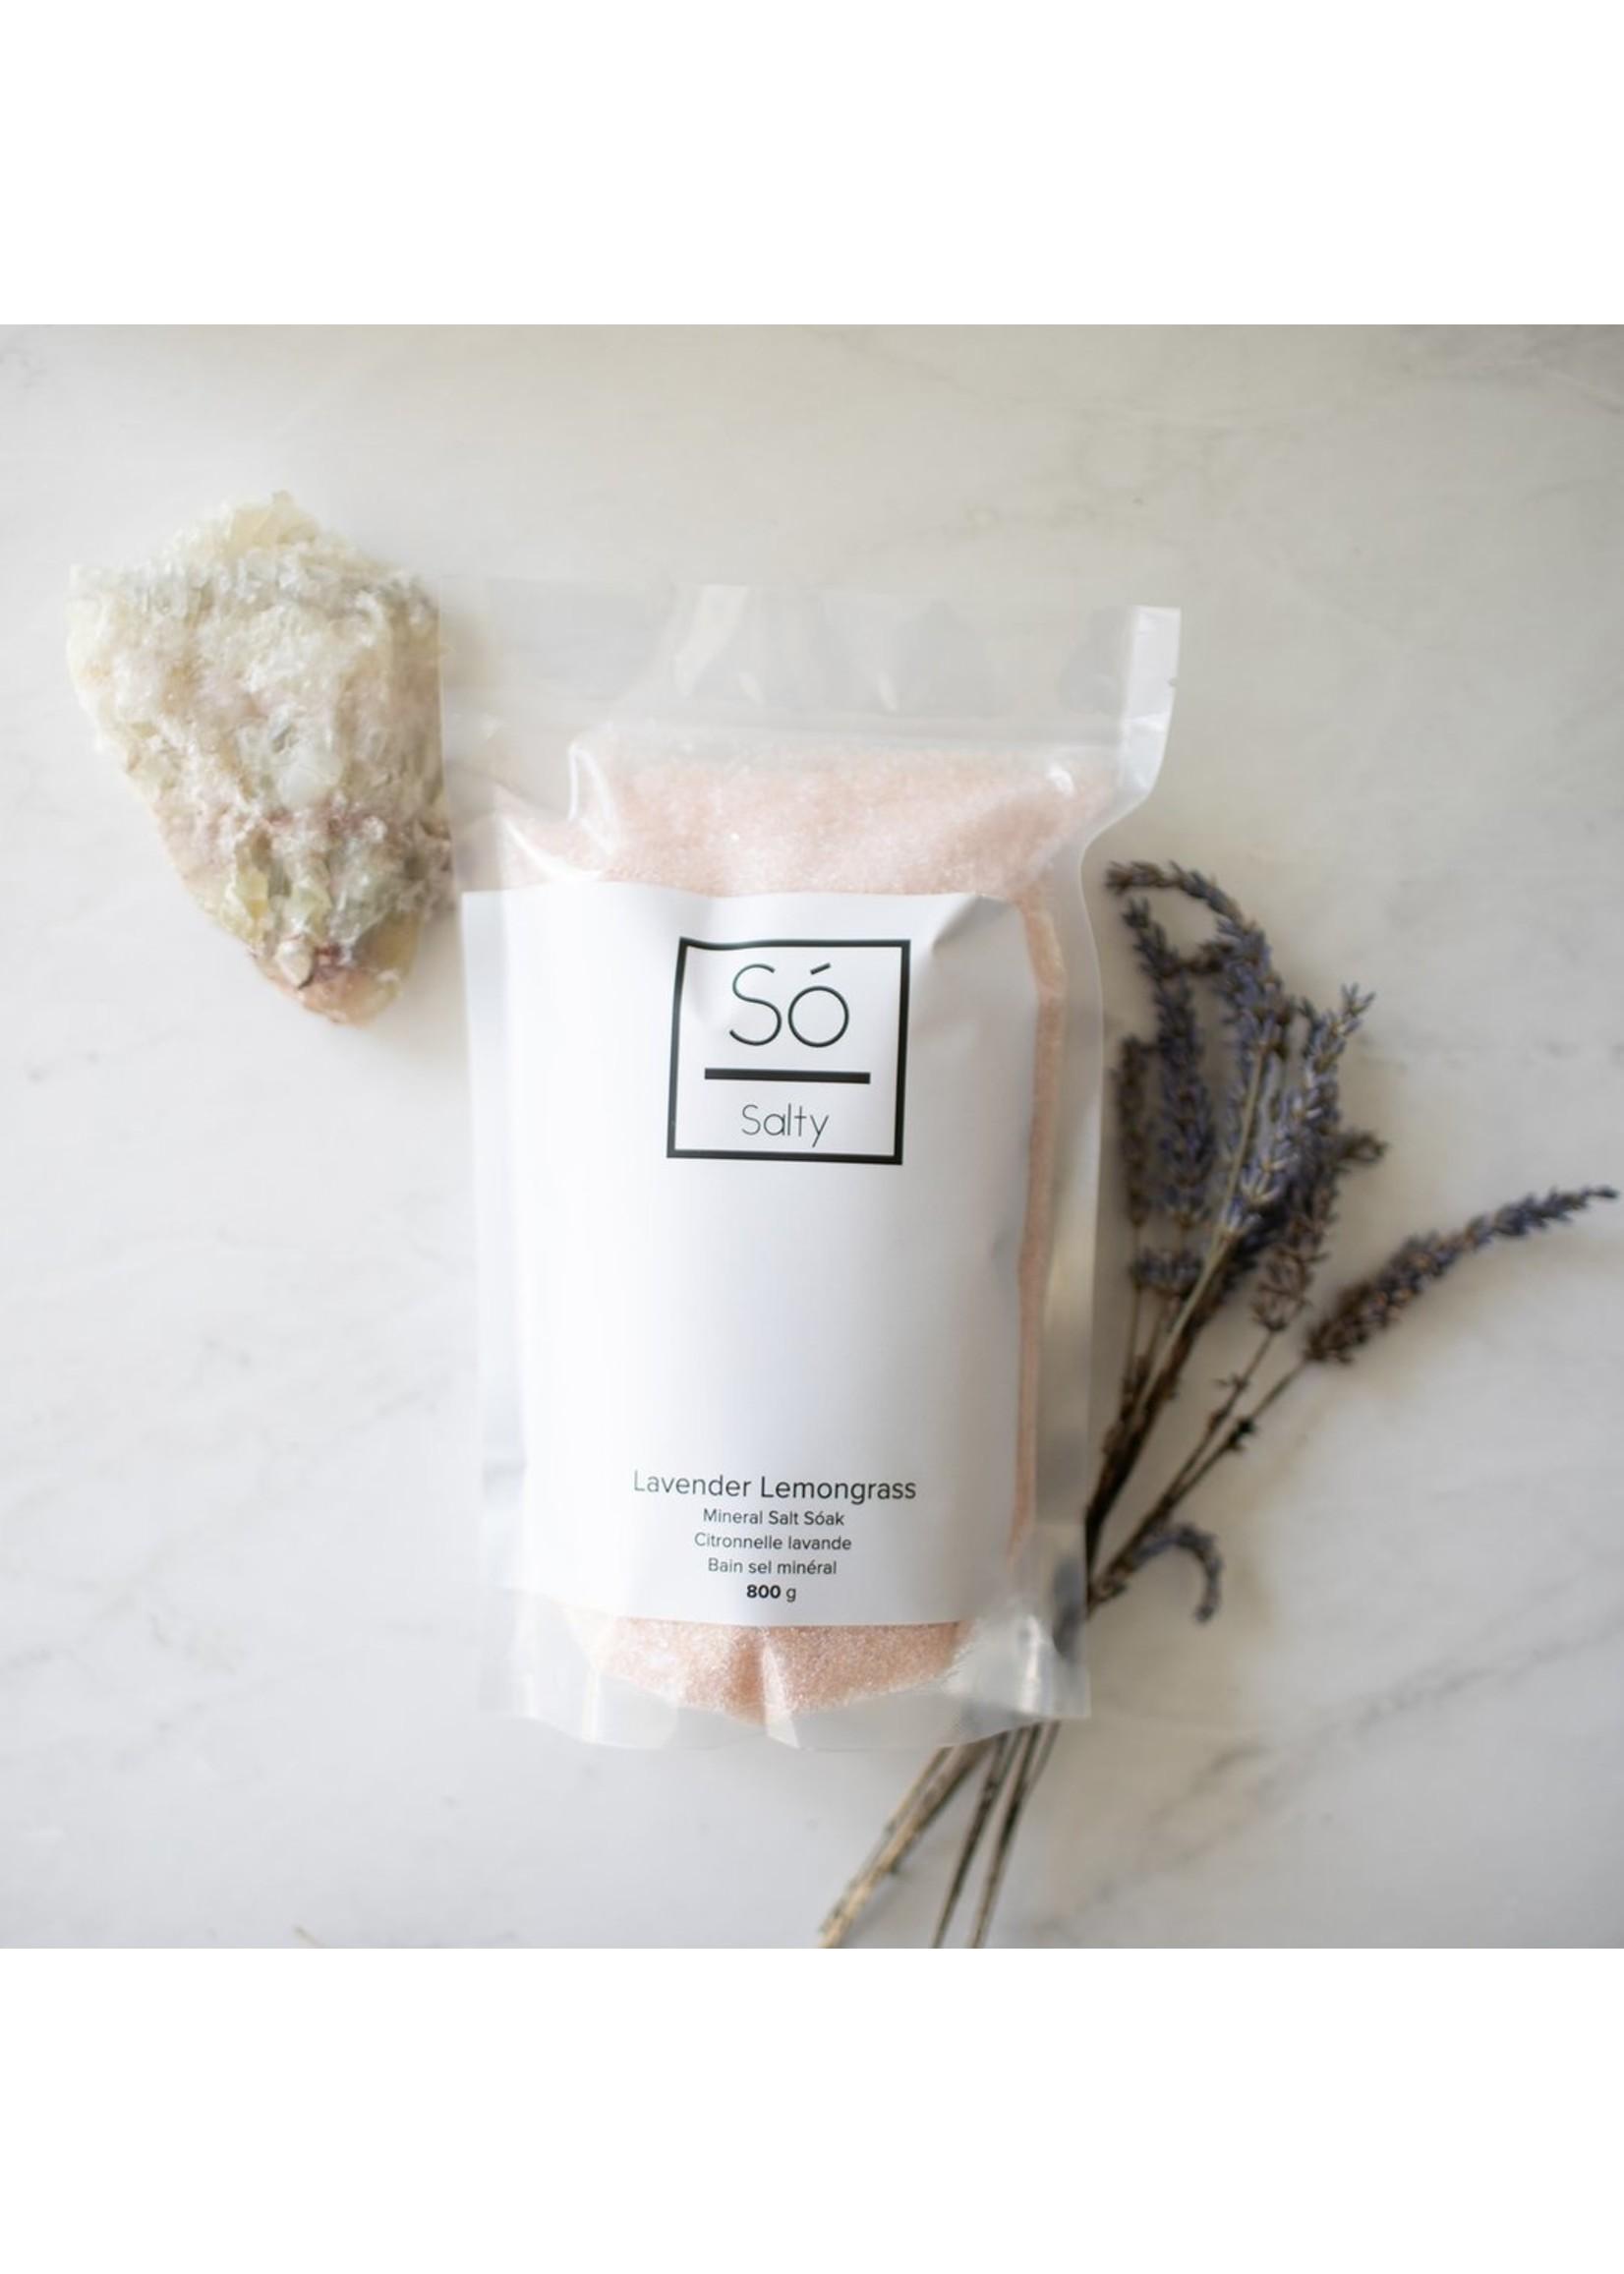 So Luxury Salty Mineral Salt Soak - Lavender Lemongrass